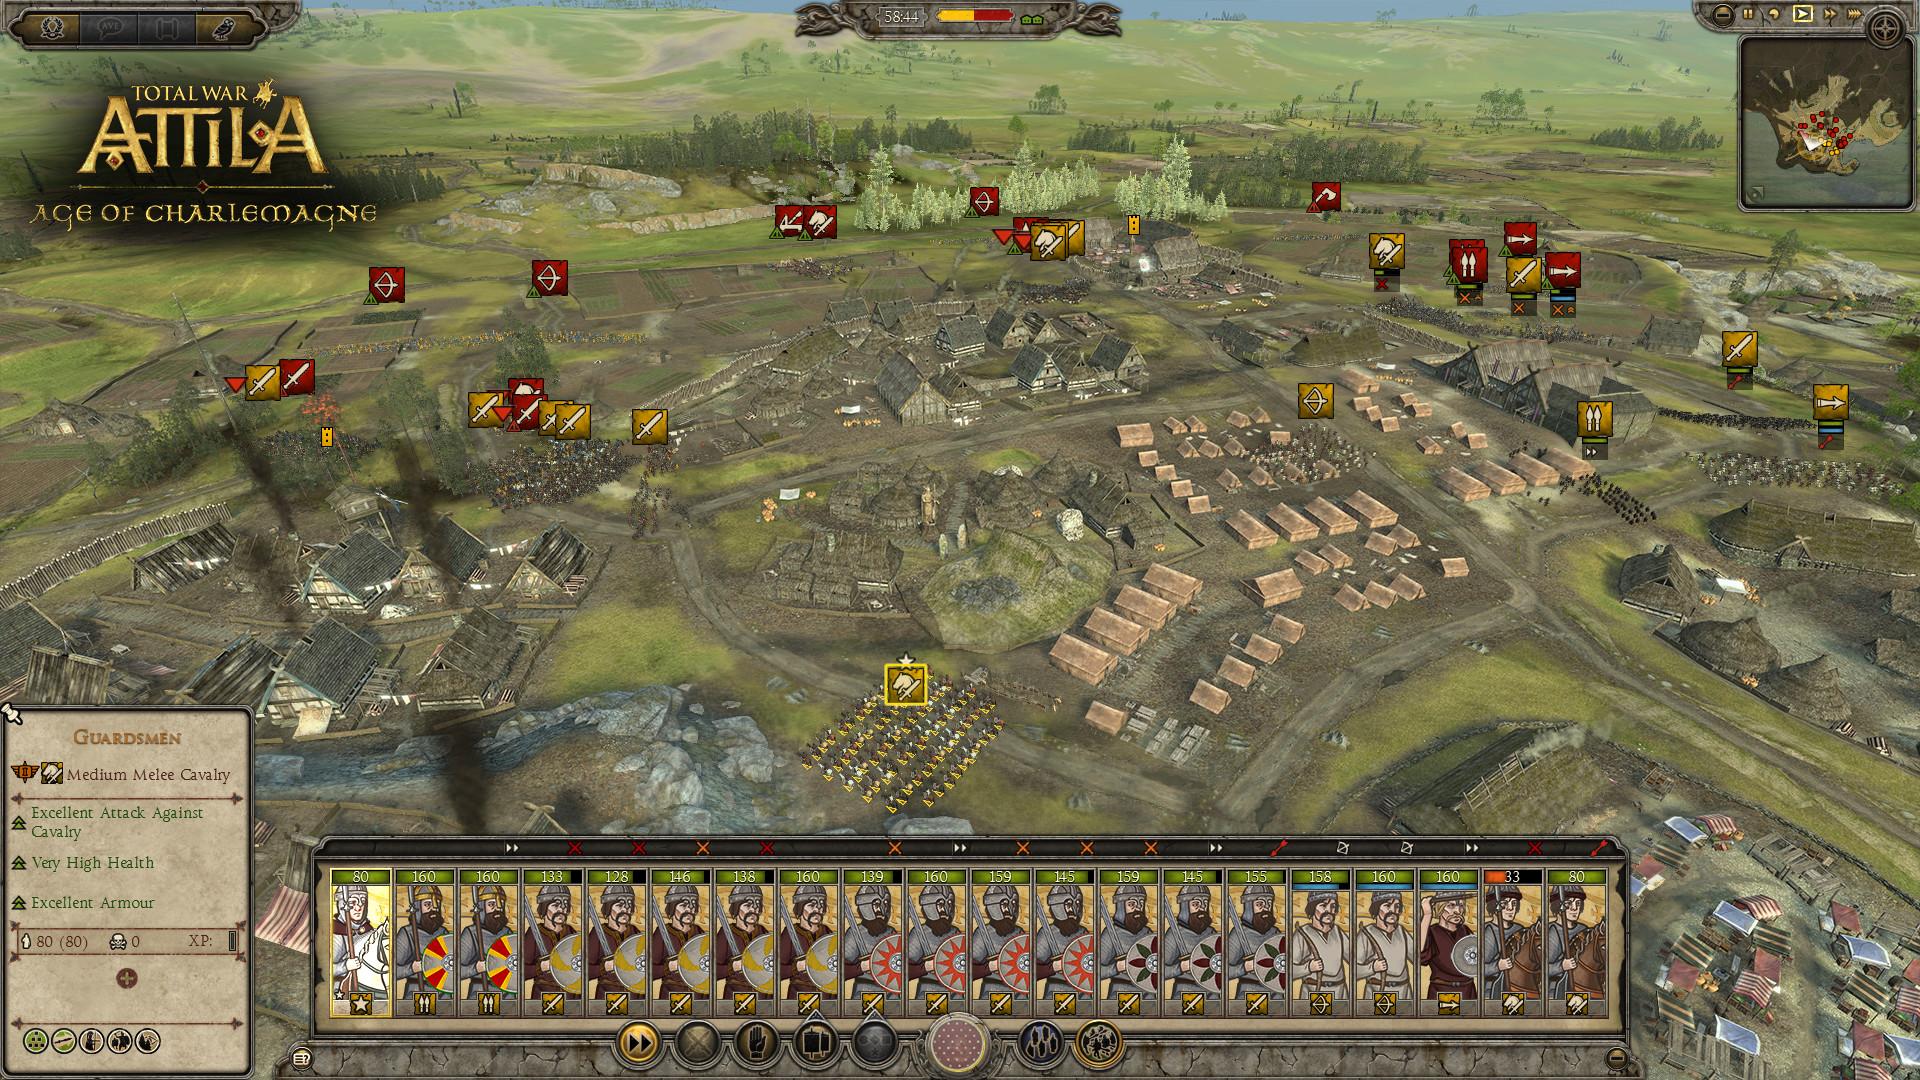 Total War: ATTILA - Age of Charlemagne Campaign Pack PC Fiyatları